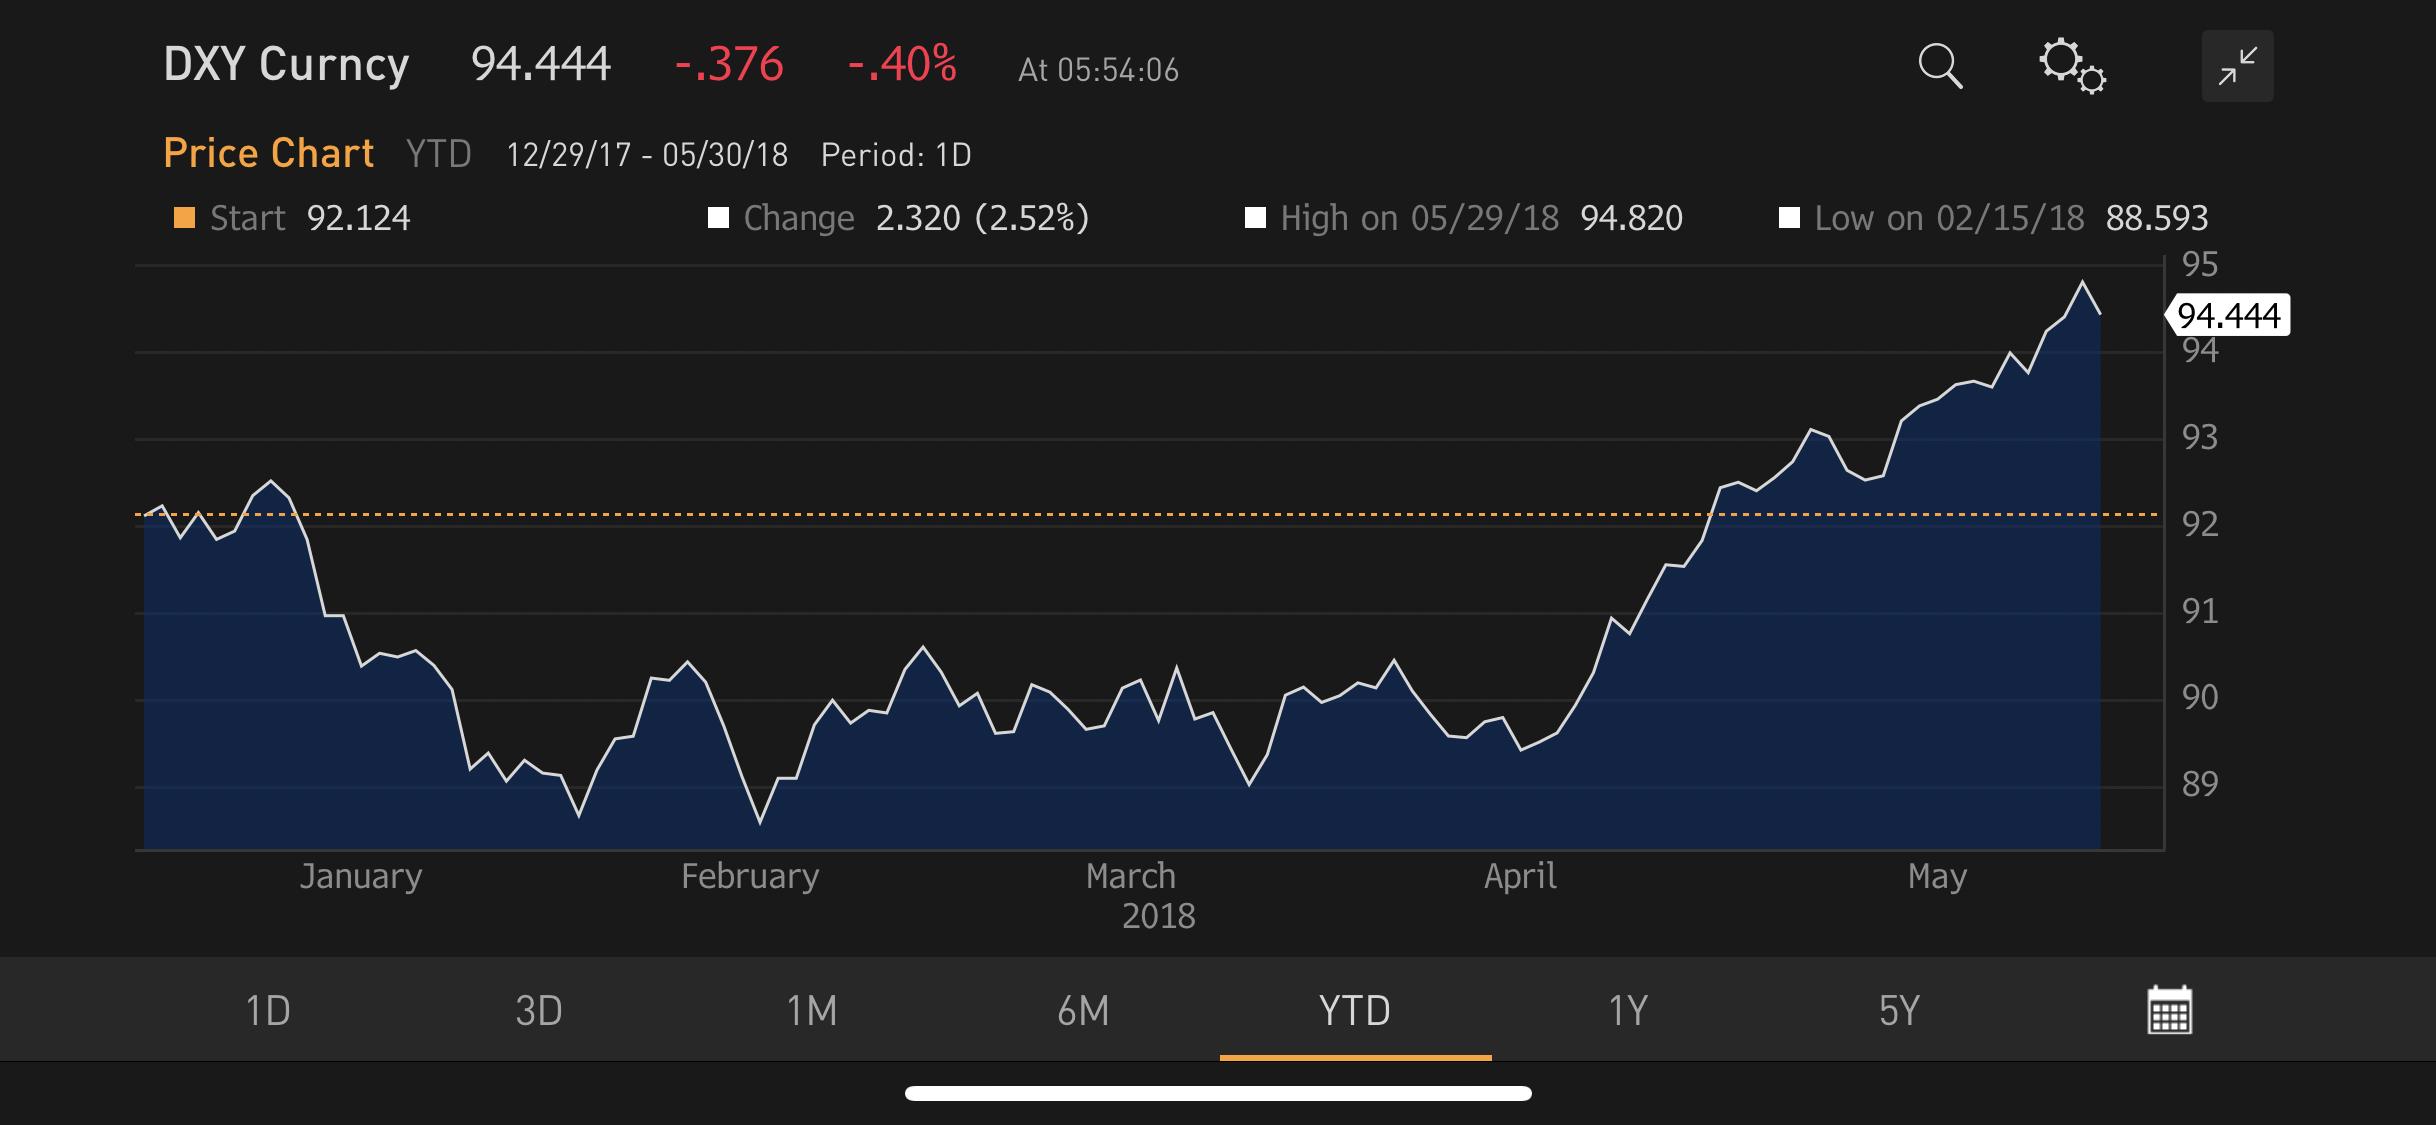 Market Update: Italian Political Crisis Sinks Global Stocks